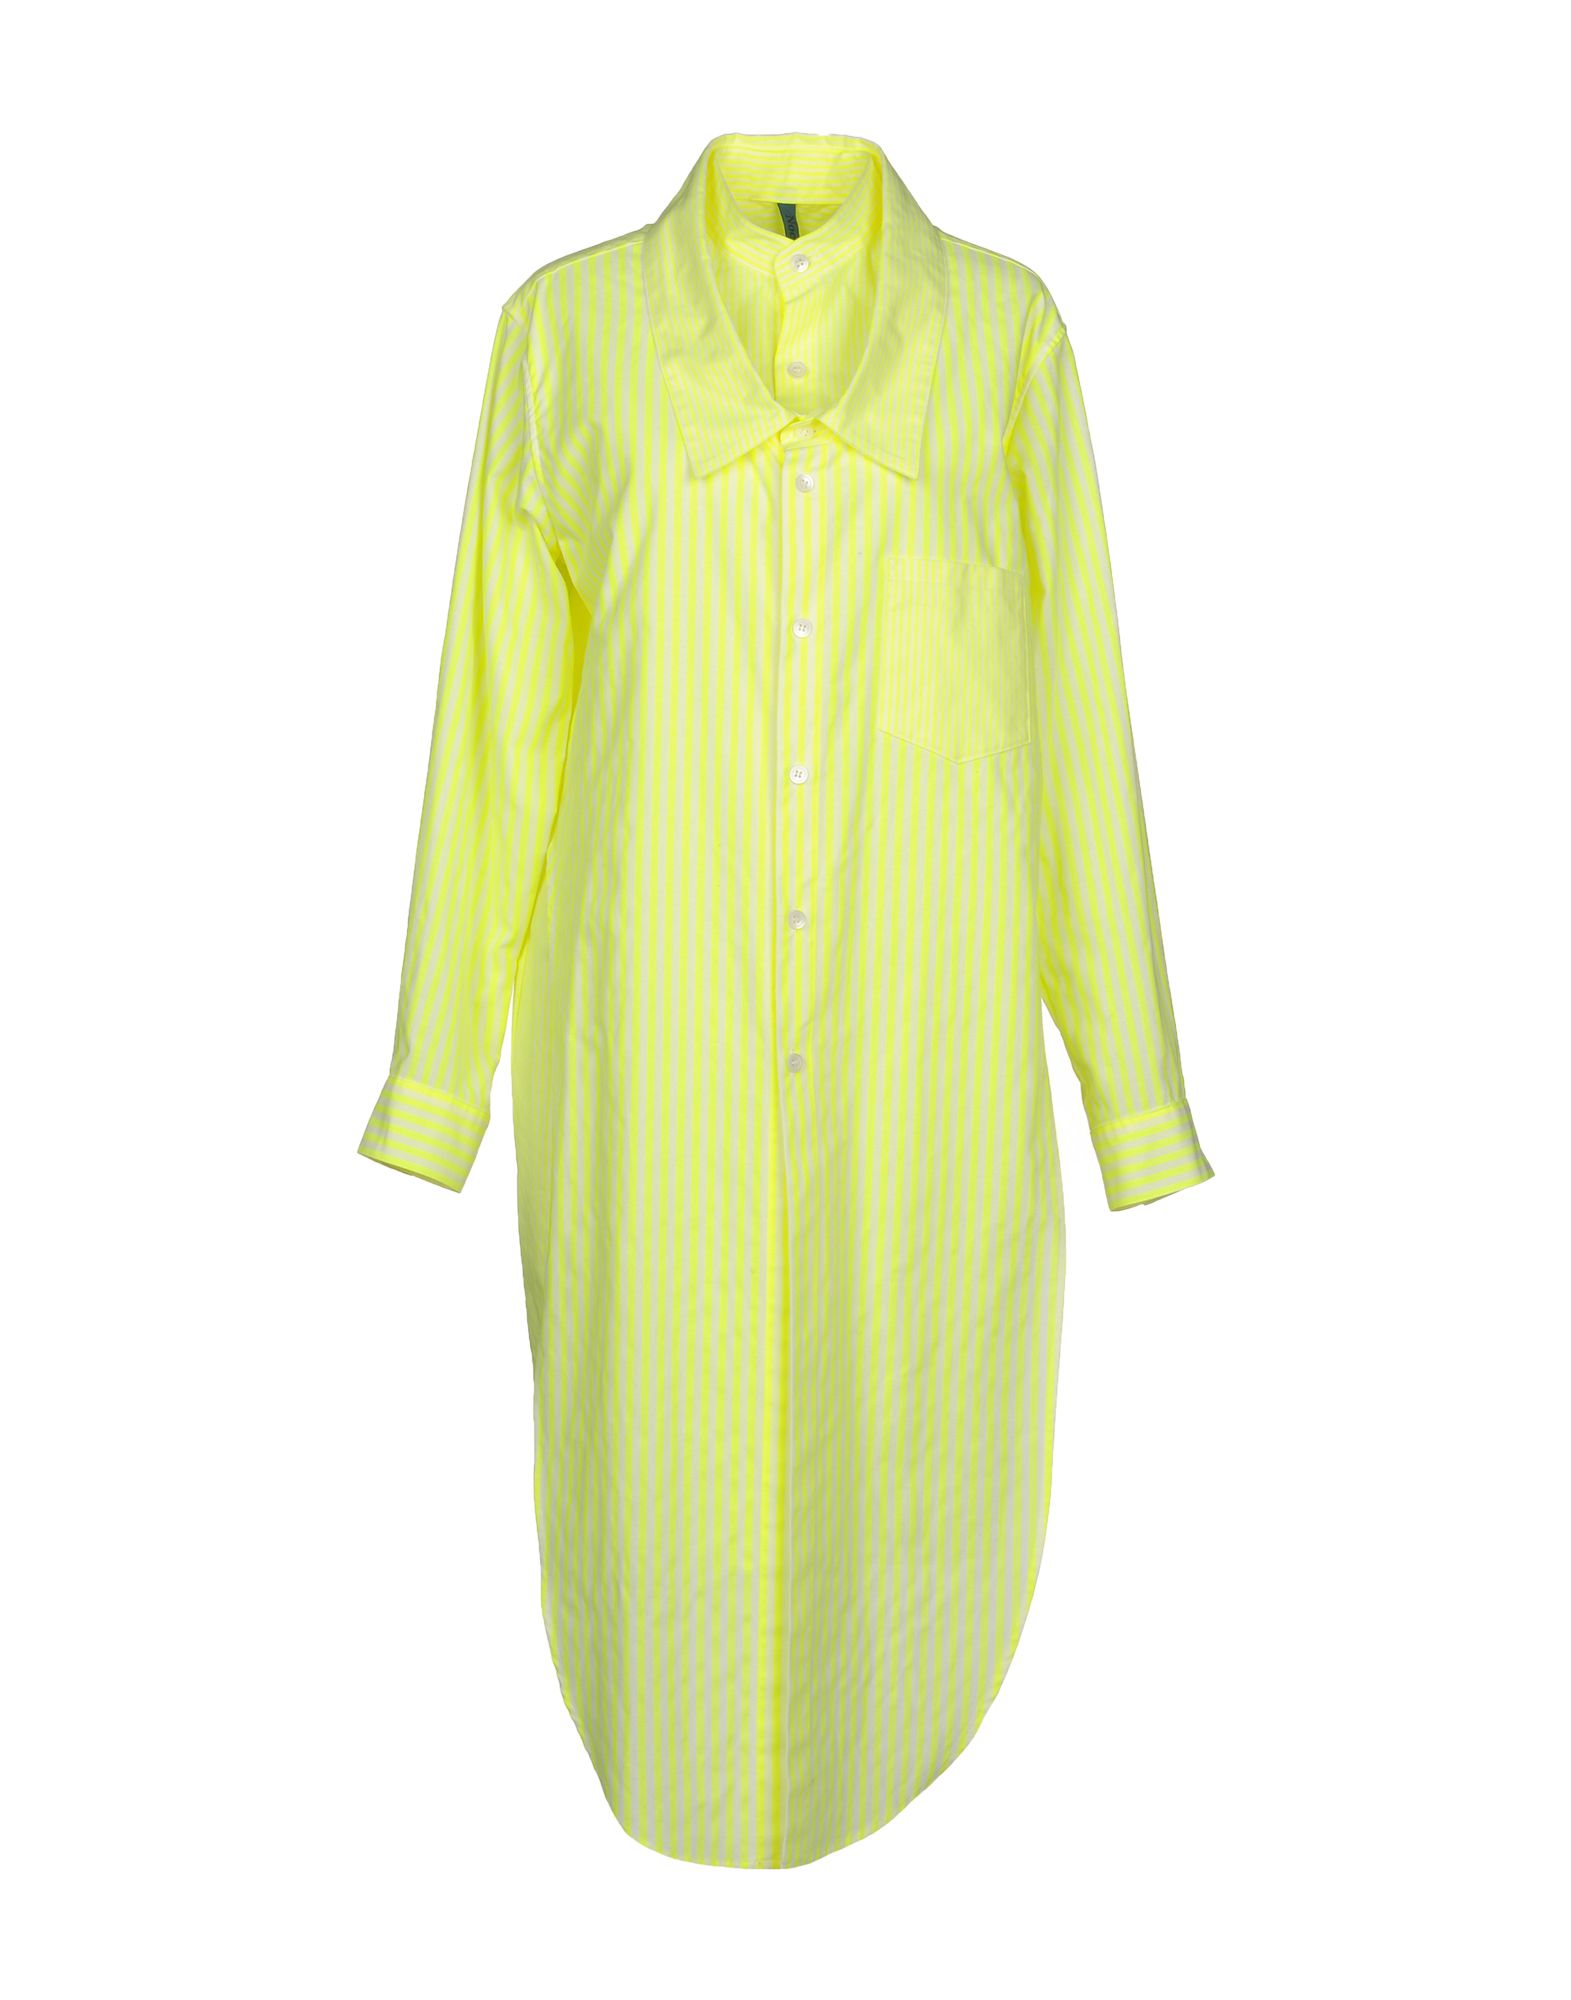 цена NOCTURNE #22 IN C SHARP MINOR, OP. POSTH. Короткое платье в интернет-магазинах